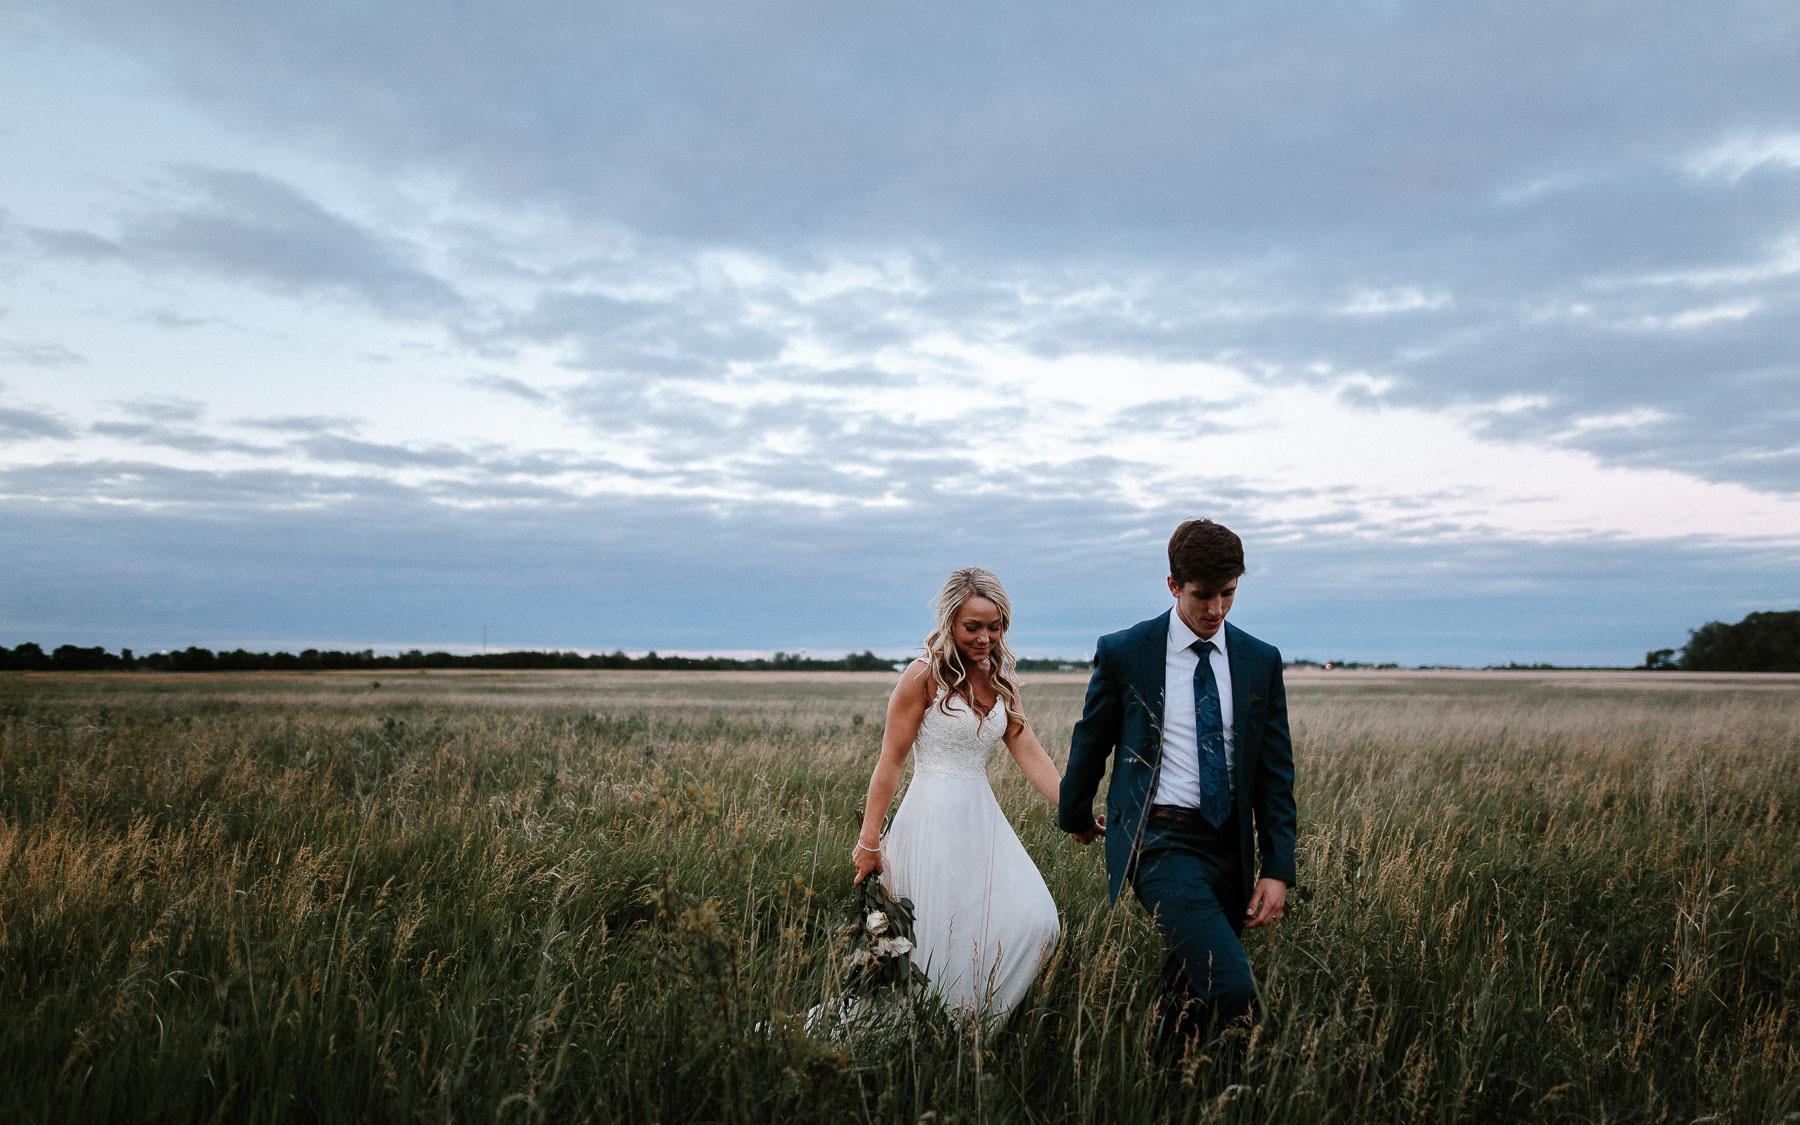 Intimate_Farmhouse_SD_Wedding_Bridgette_Philip_068.jpg